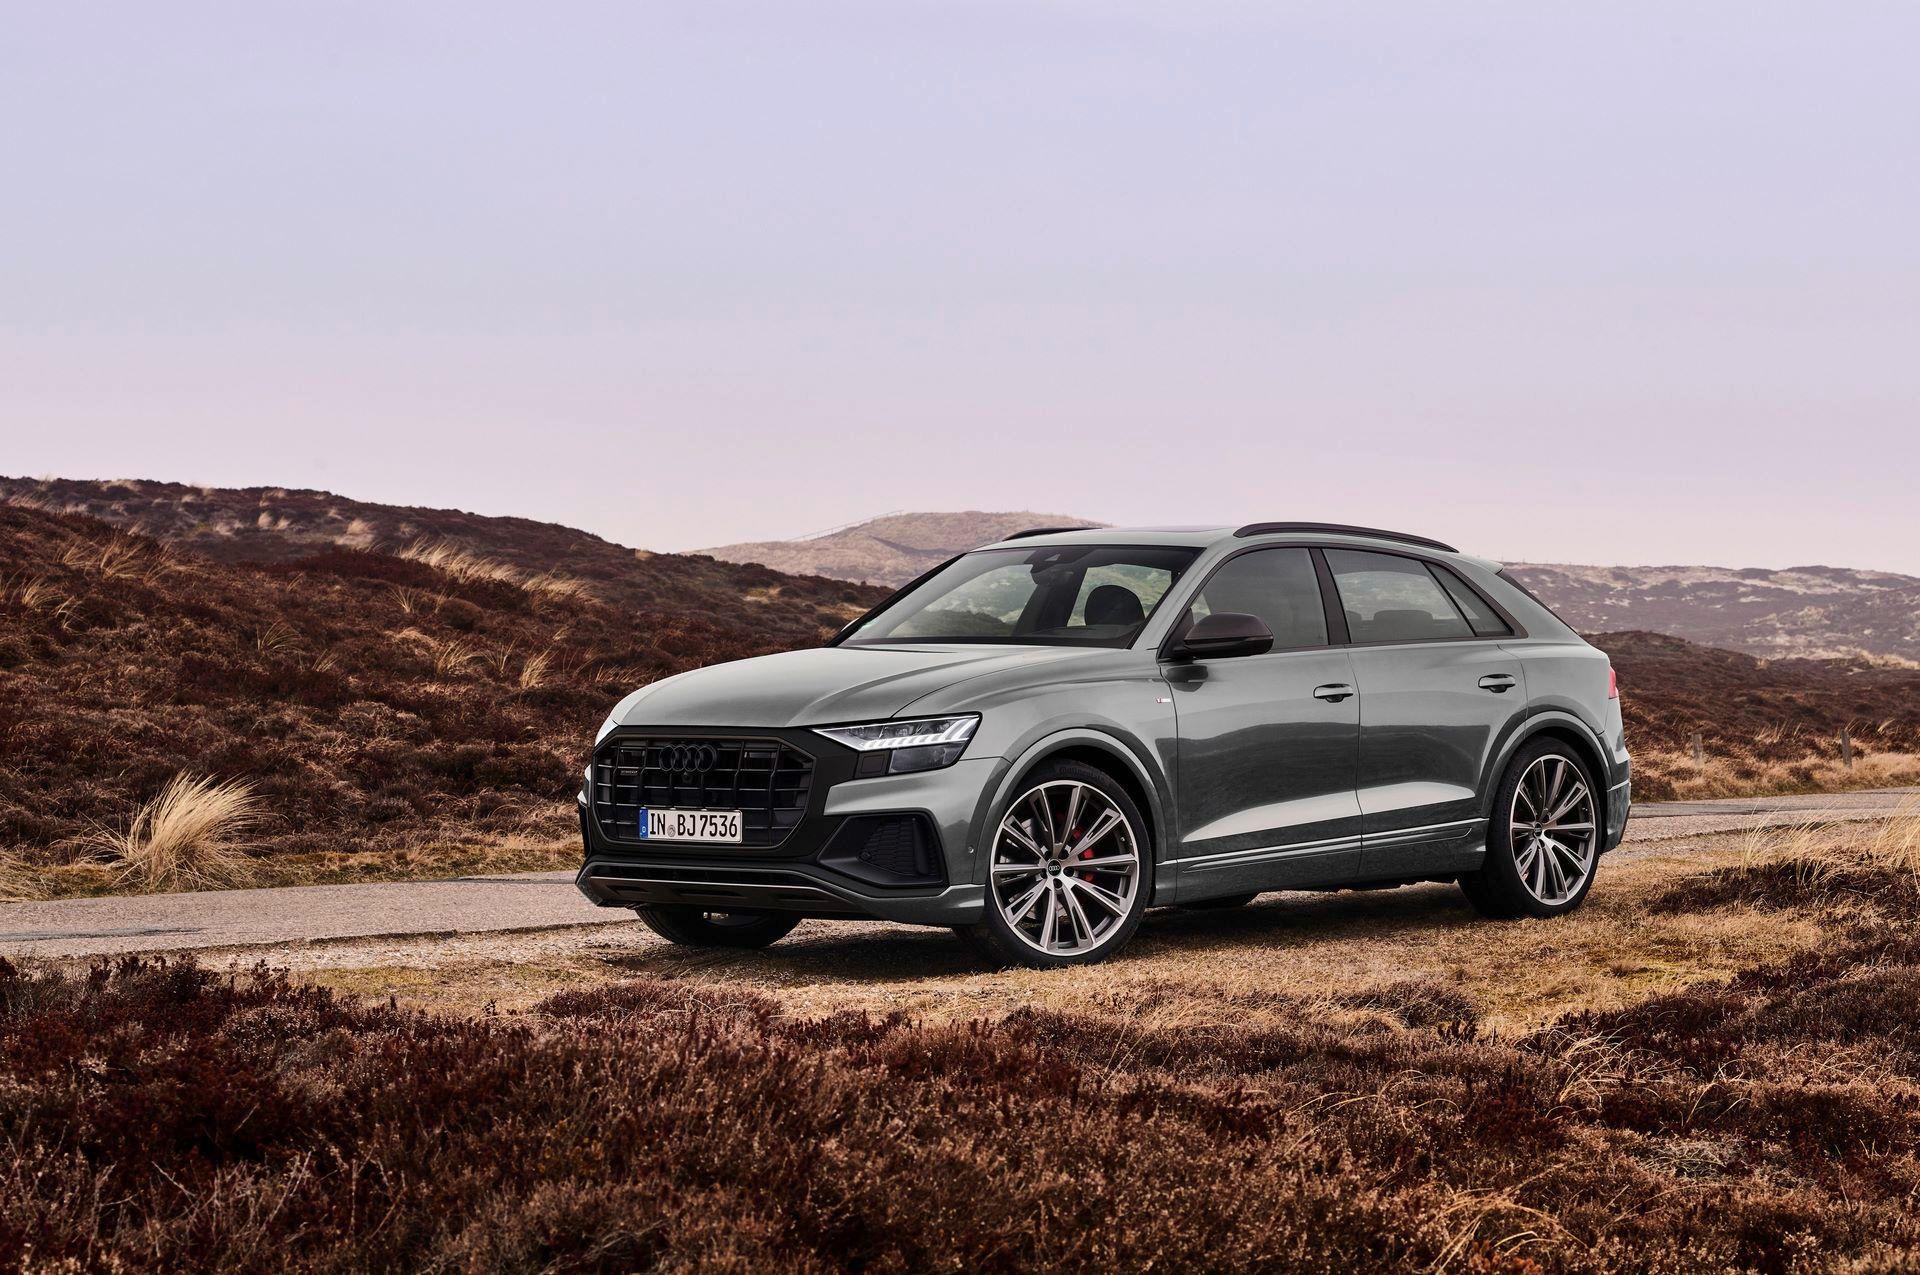 Audi-A4-A5-Q7-Q8-Competition-And-Competition-Plus-Trims-16